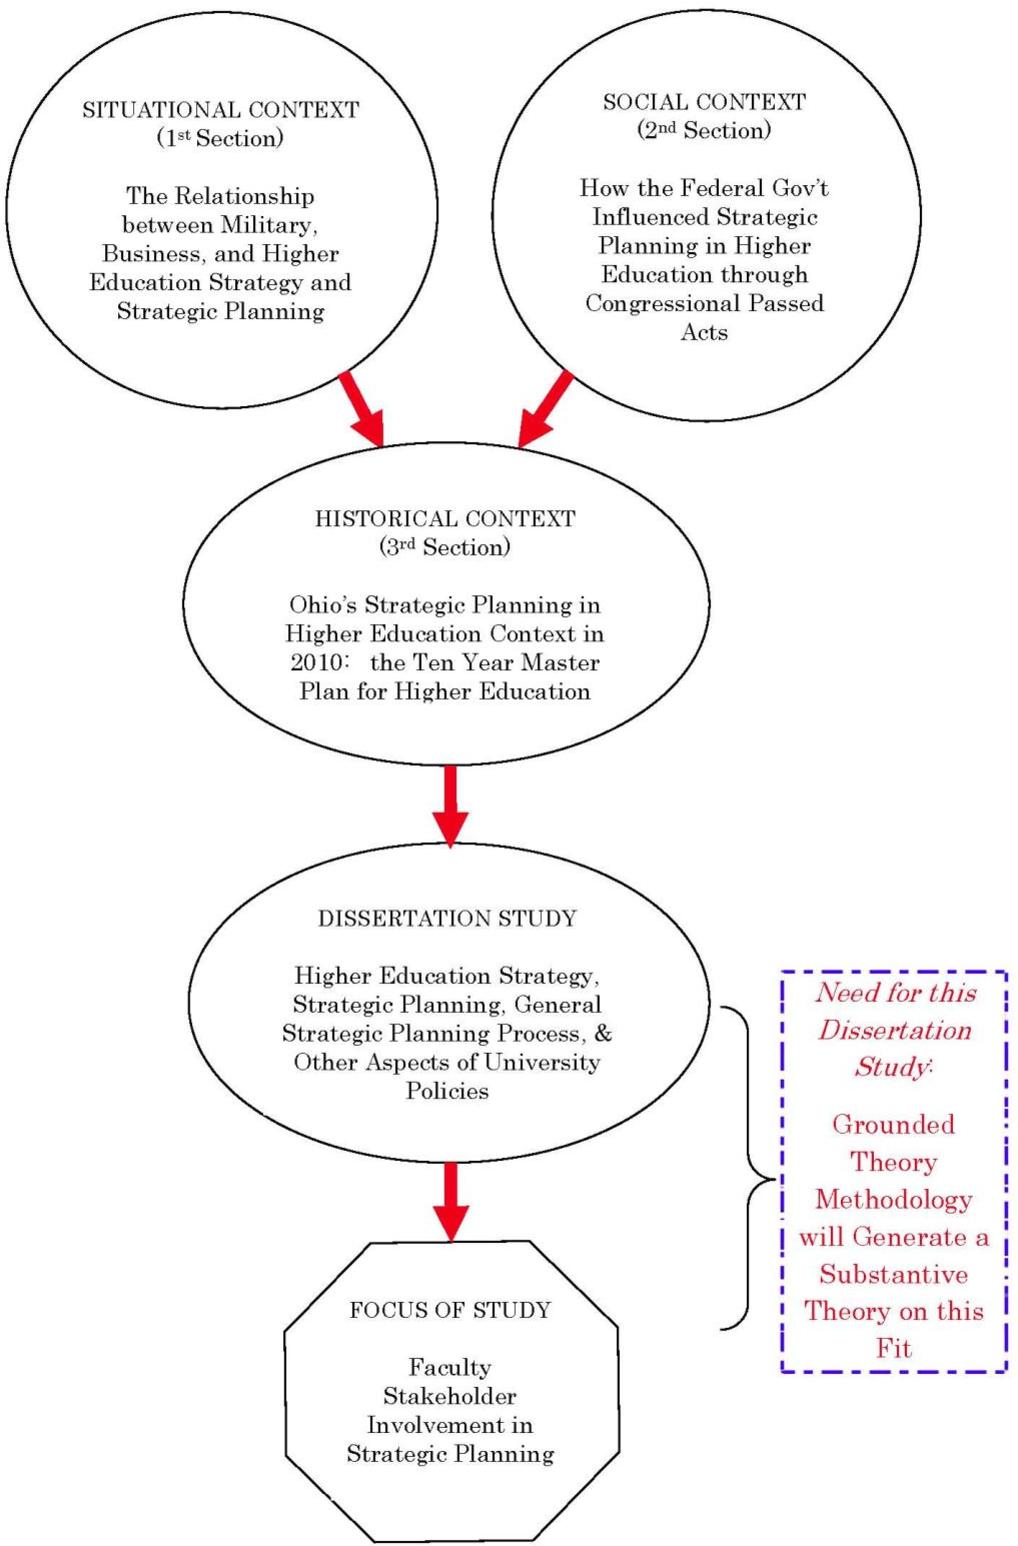 Custom dissertation introduction editor service online